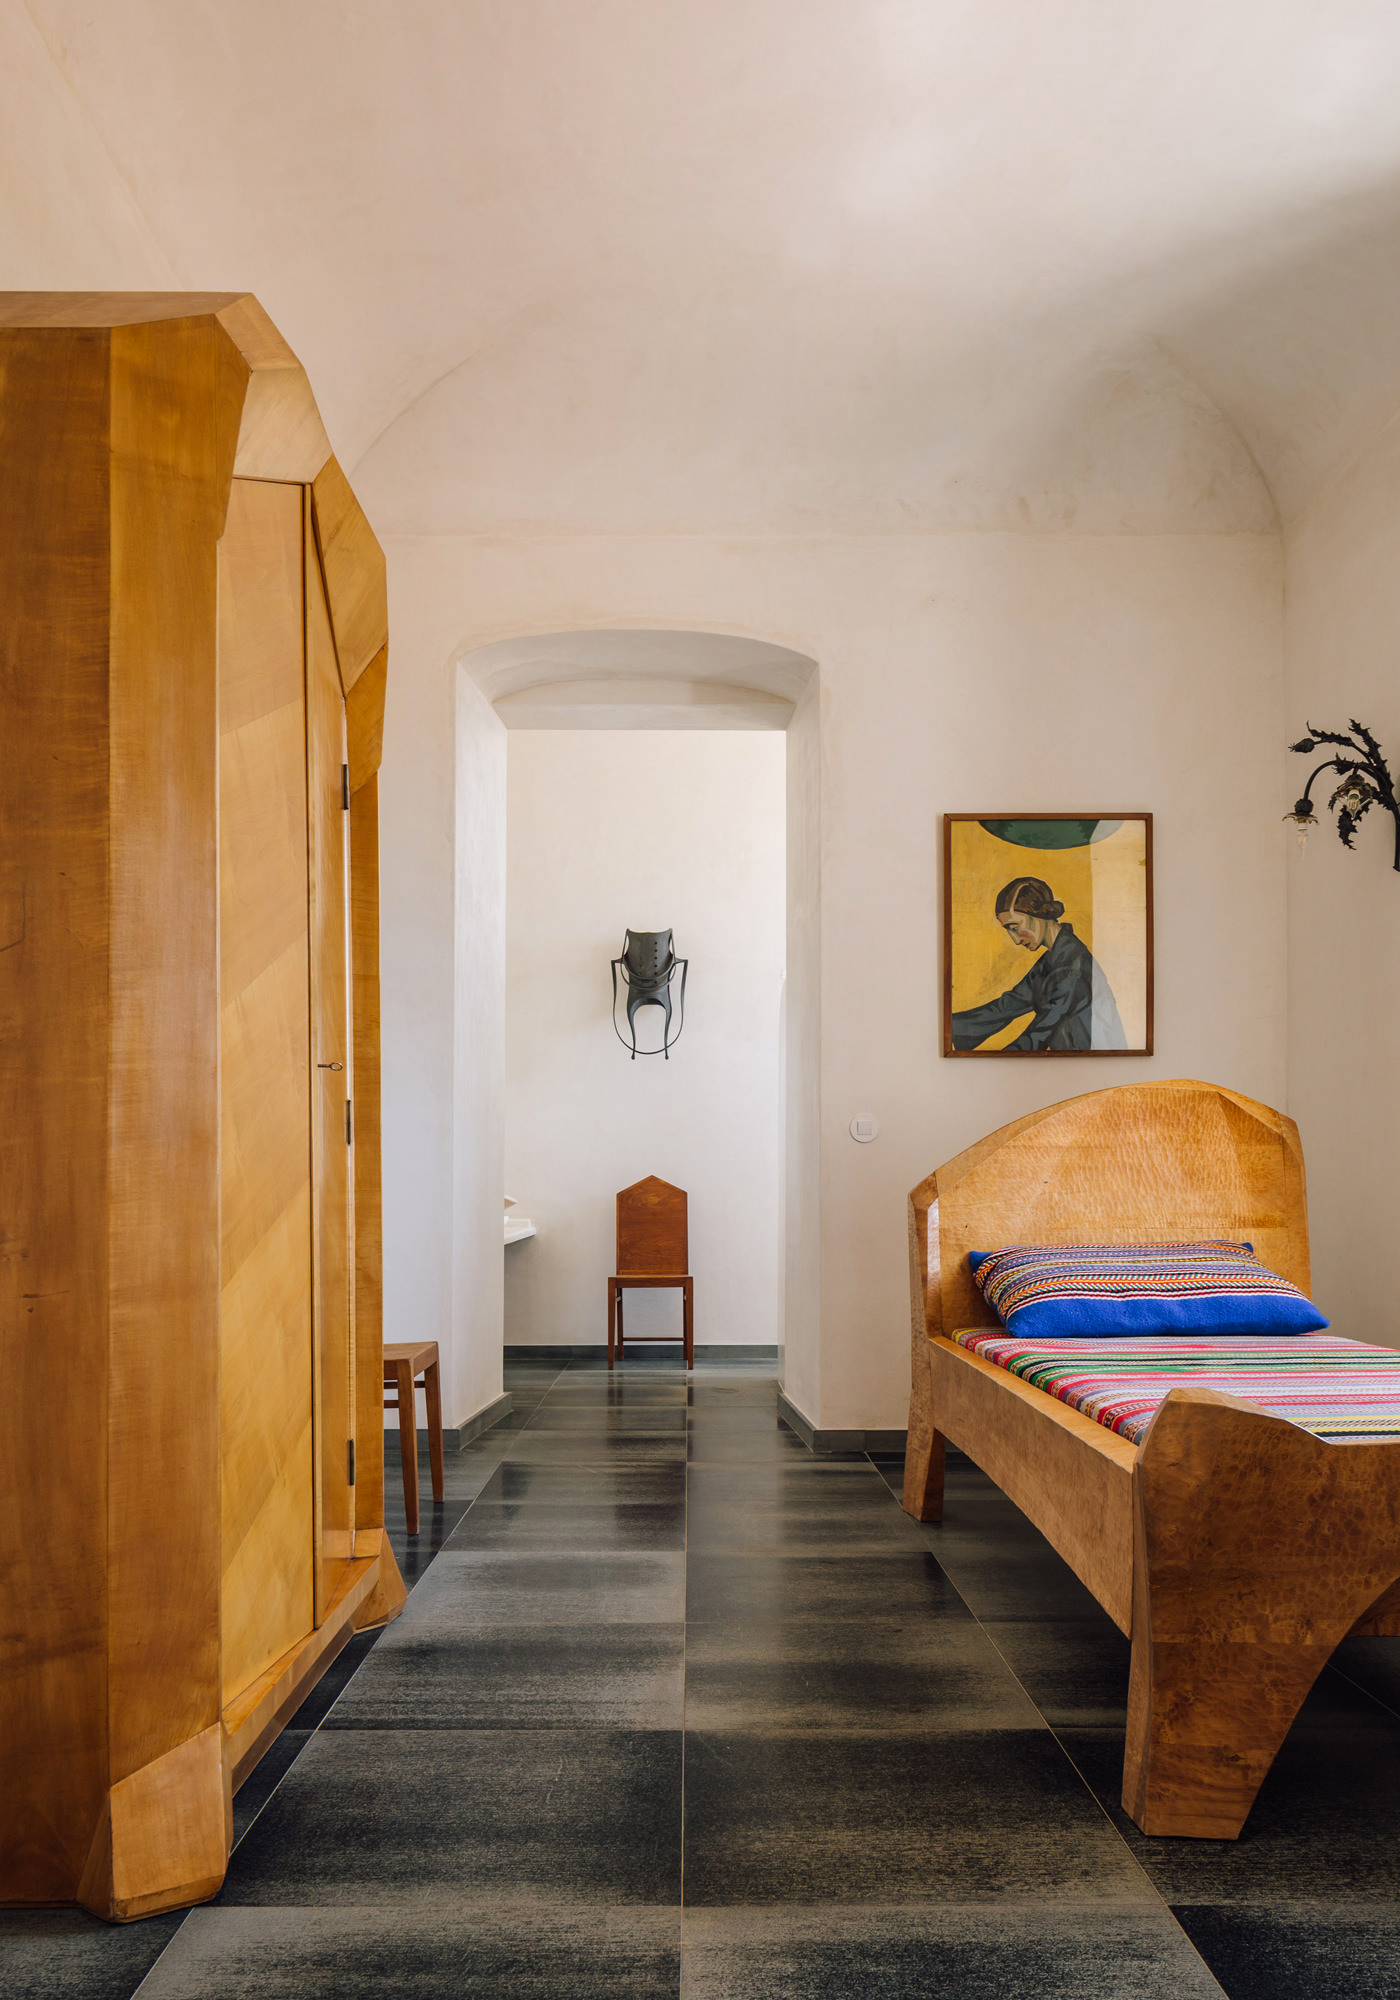 Da Licenca Hotel Alentejo Estremoz Portugal Chambres